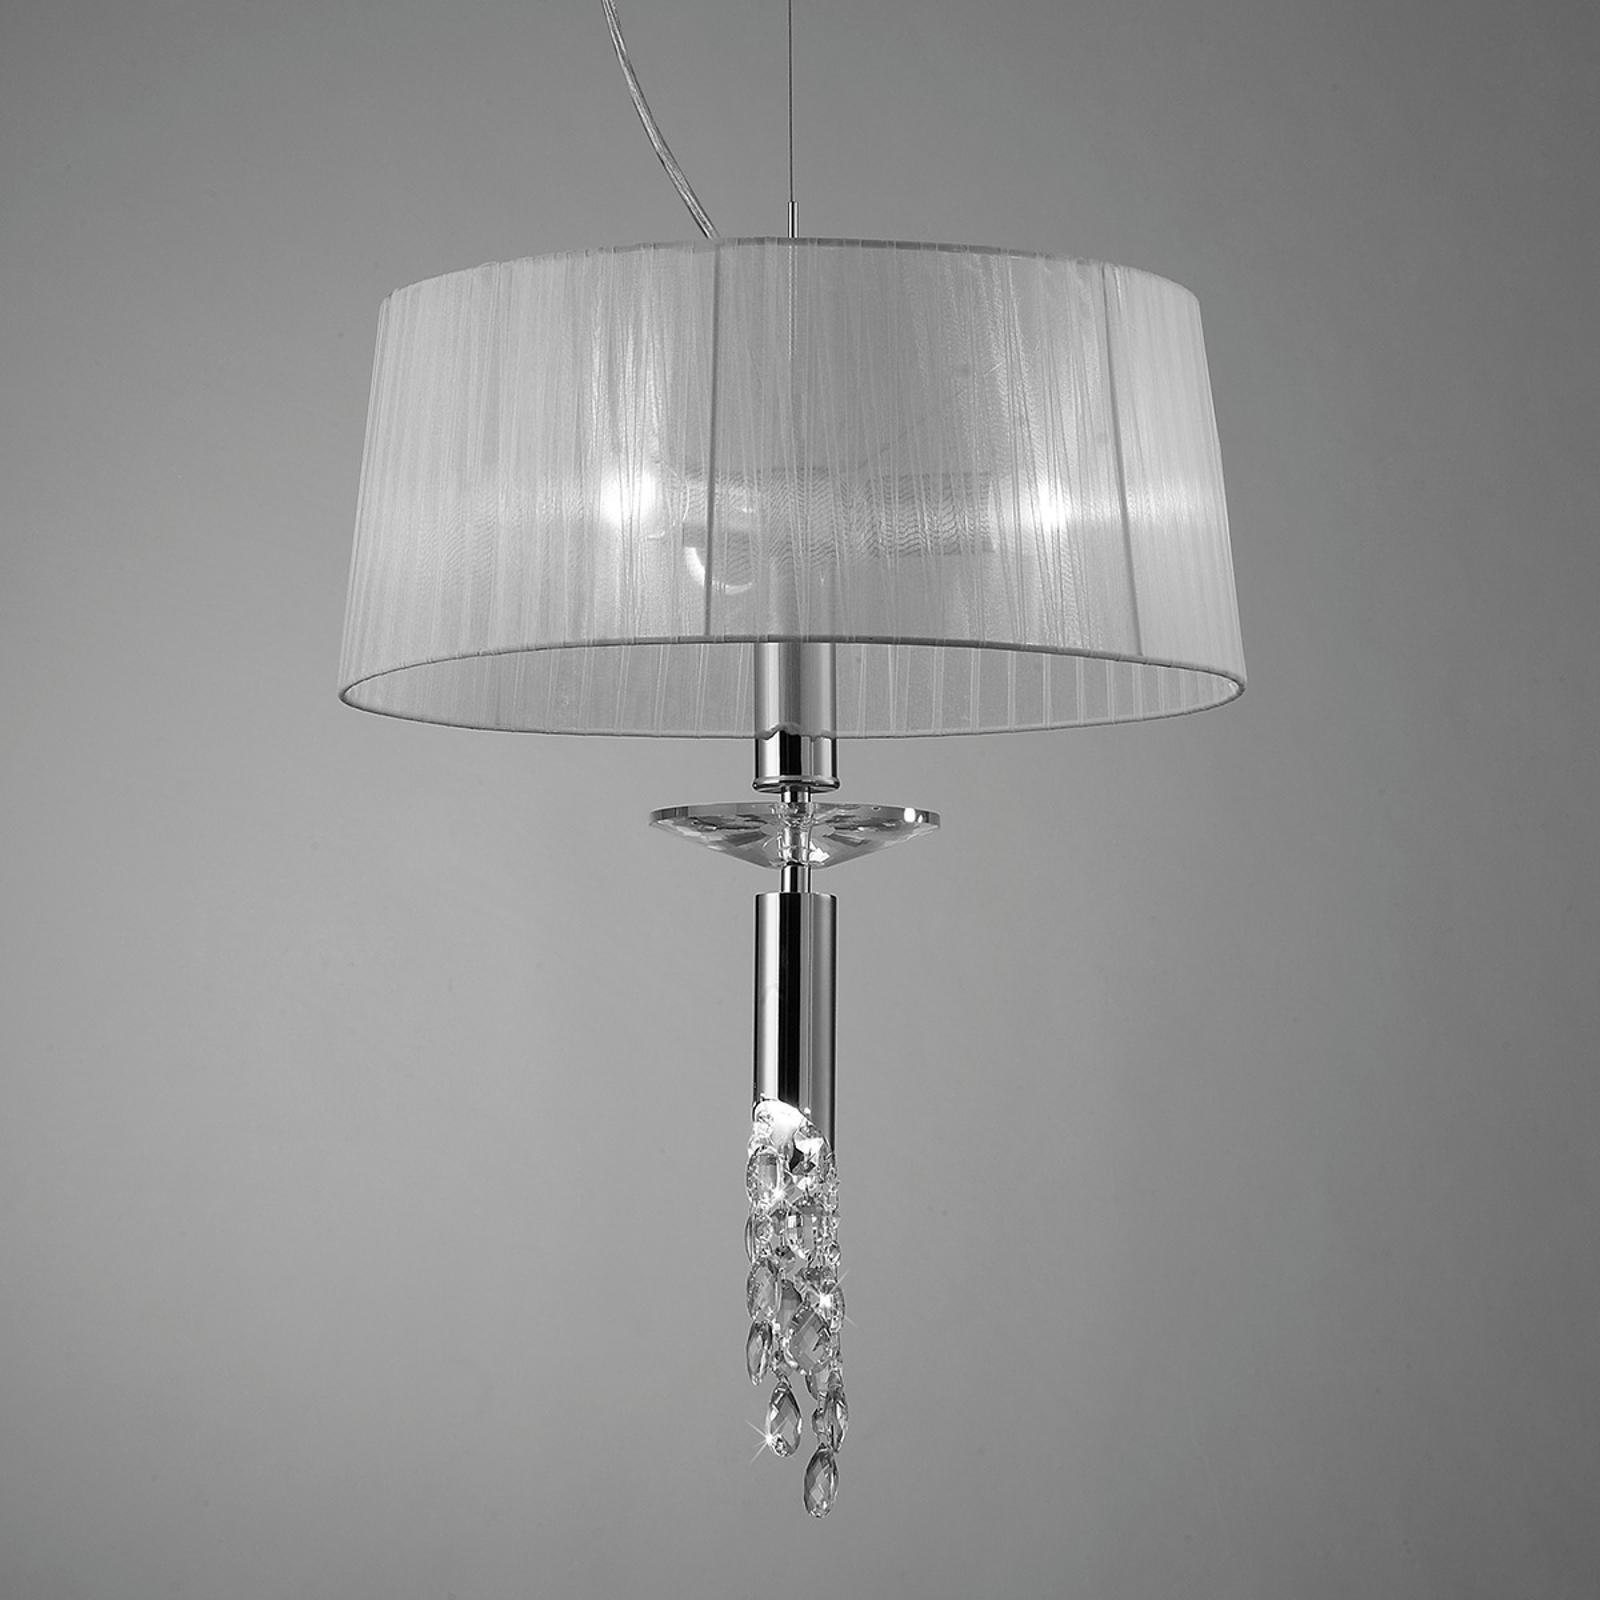 Lampada a sospensione Lilja Ø 46 cm